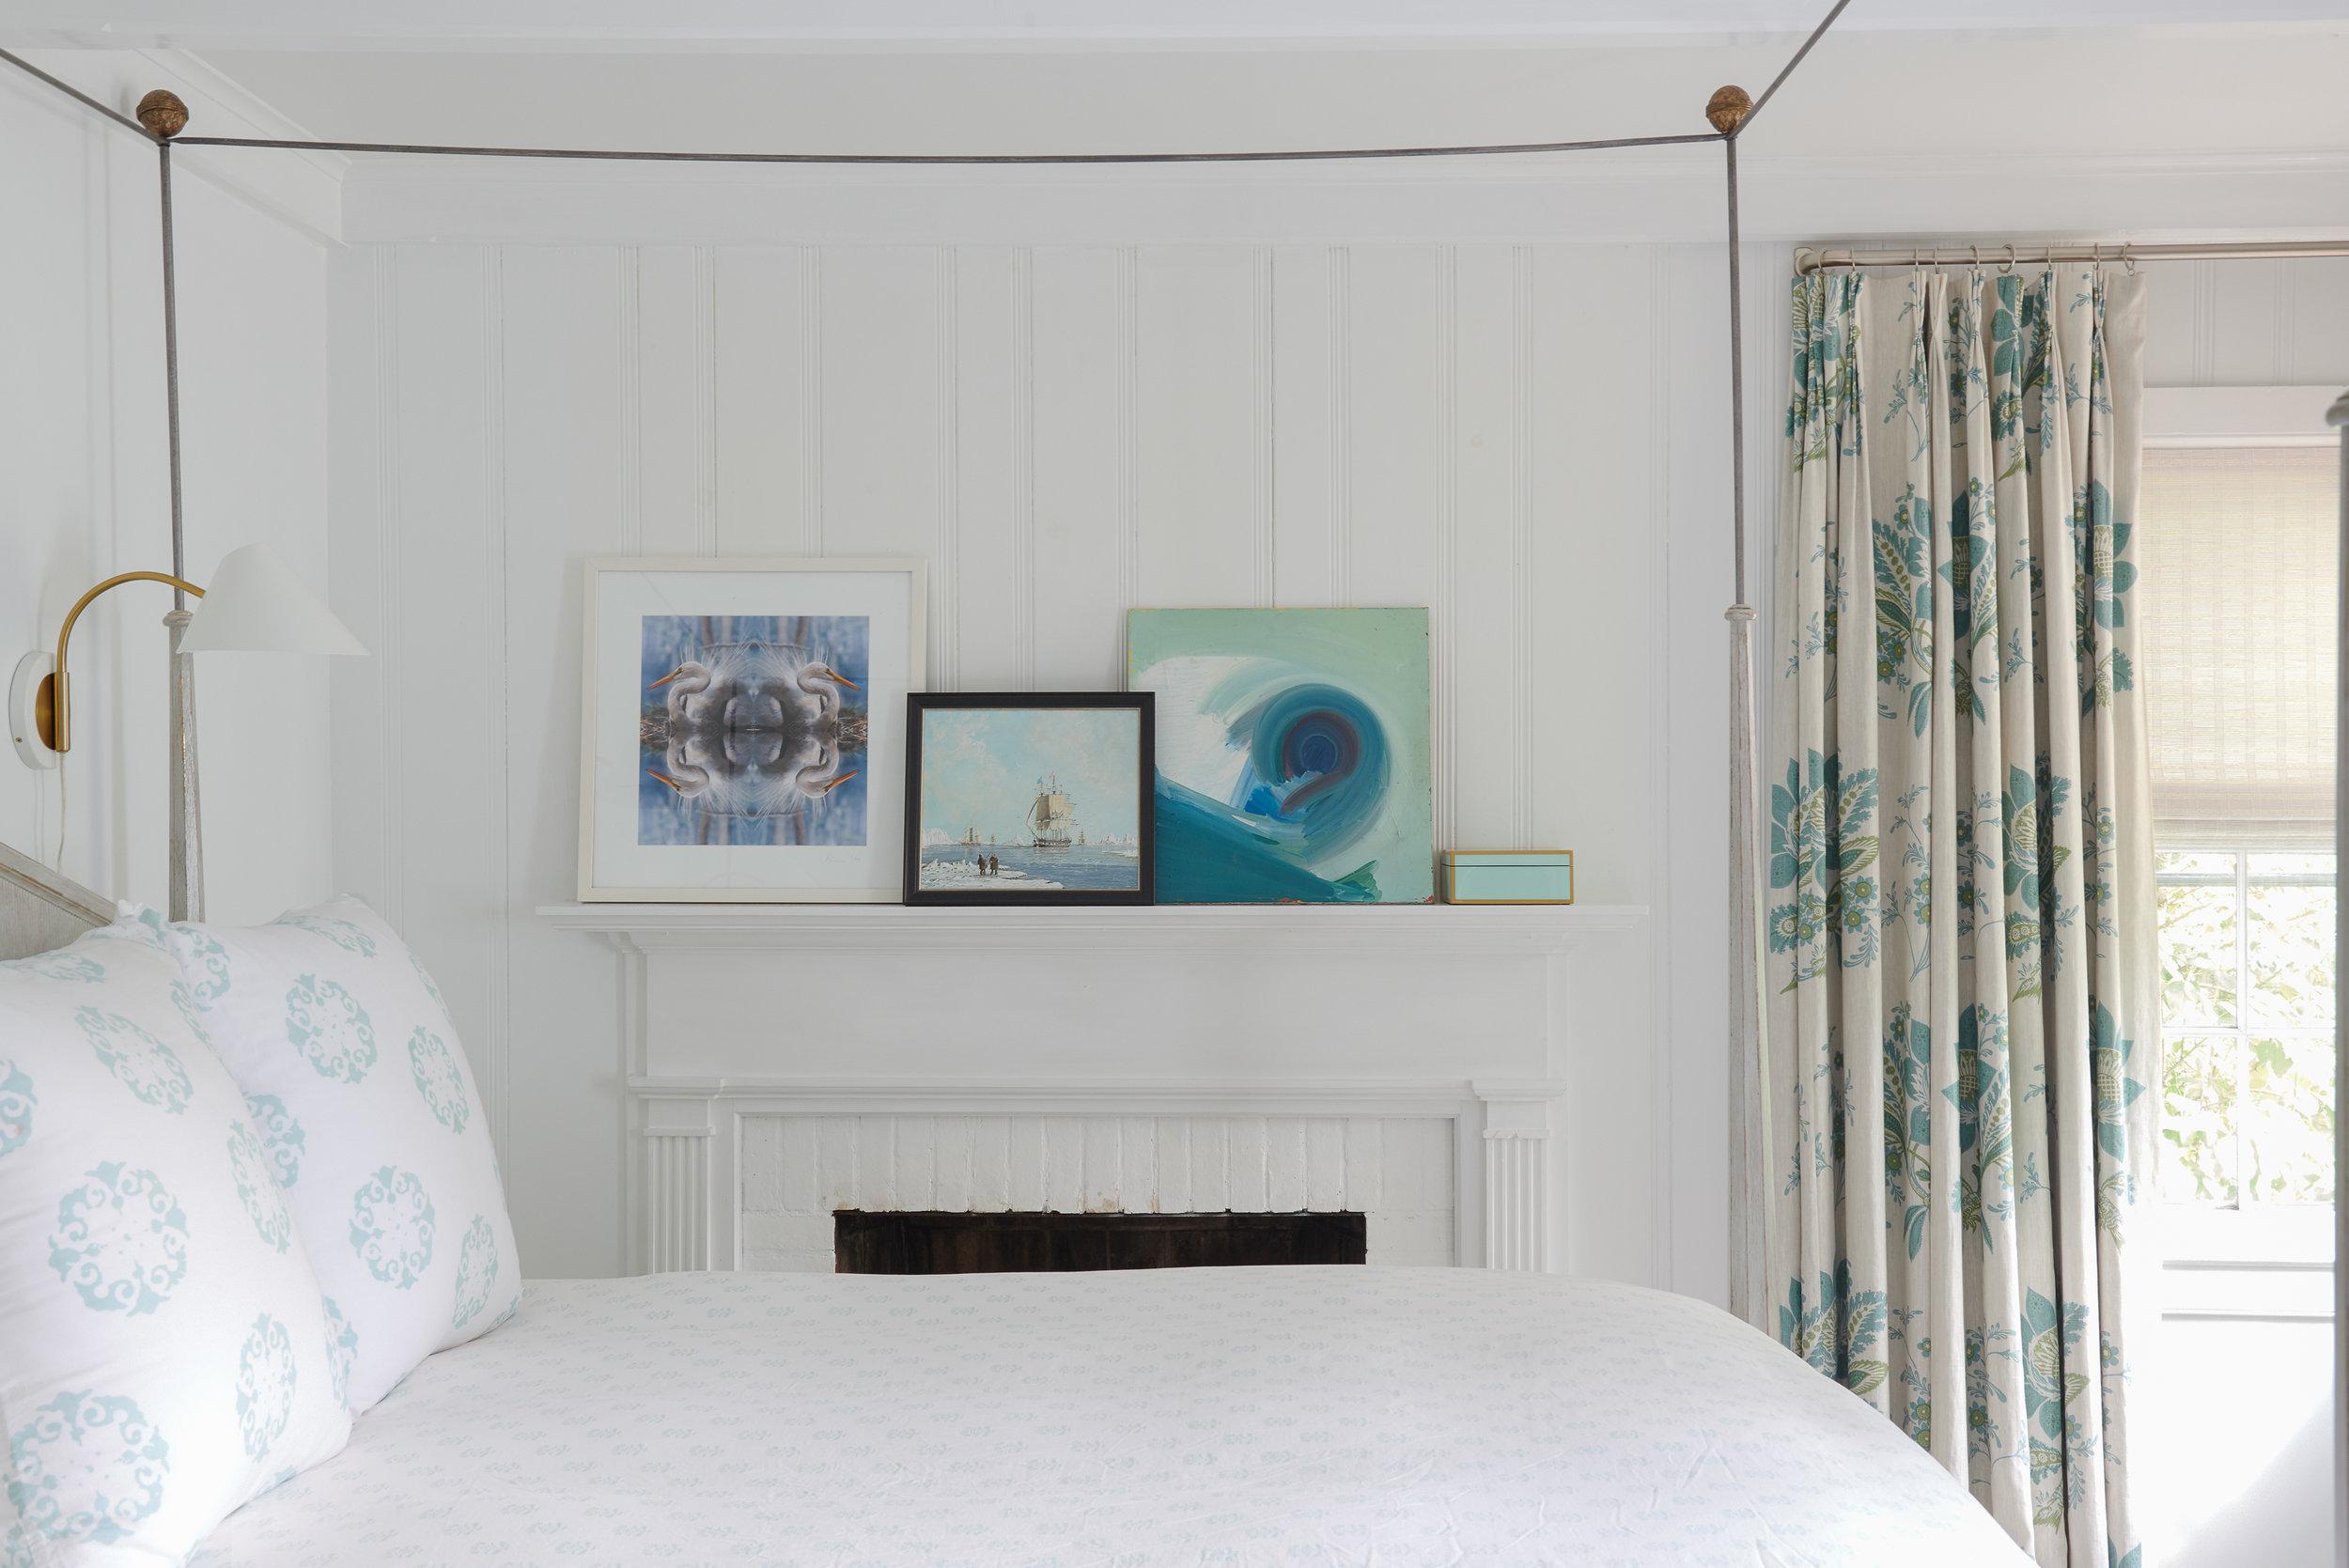 Lyon-Field-Emily-Lyon-interior-design-bedroom-©Jane Beiles-2500.jpg